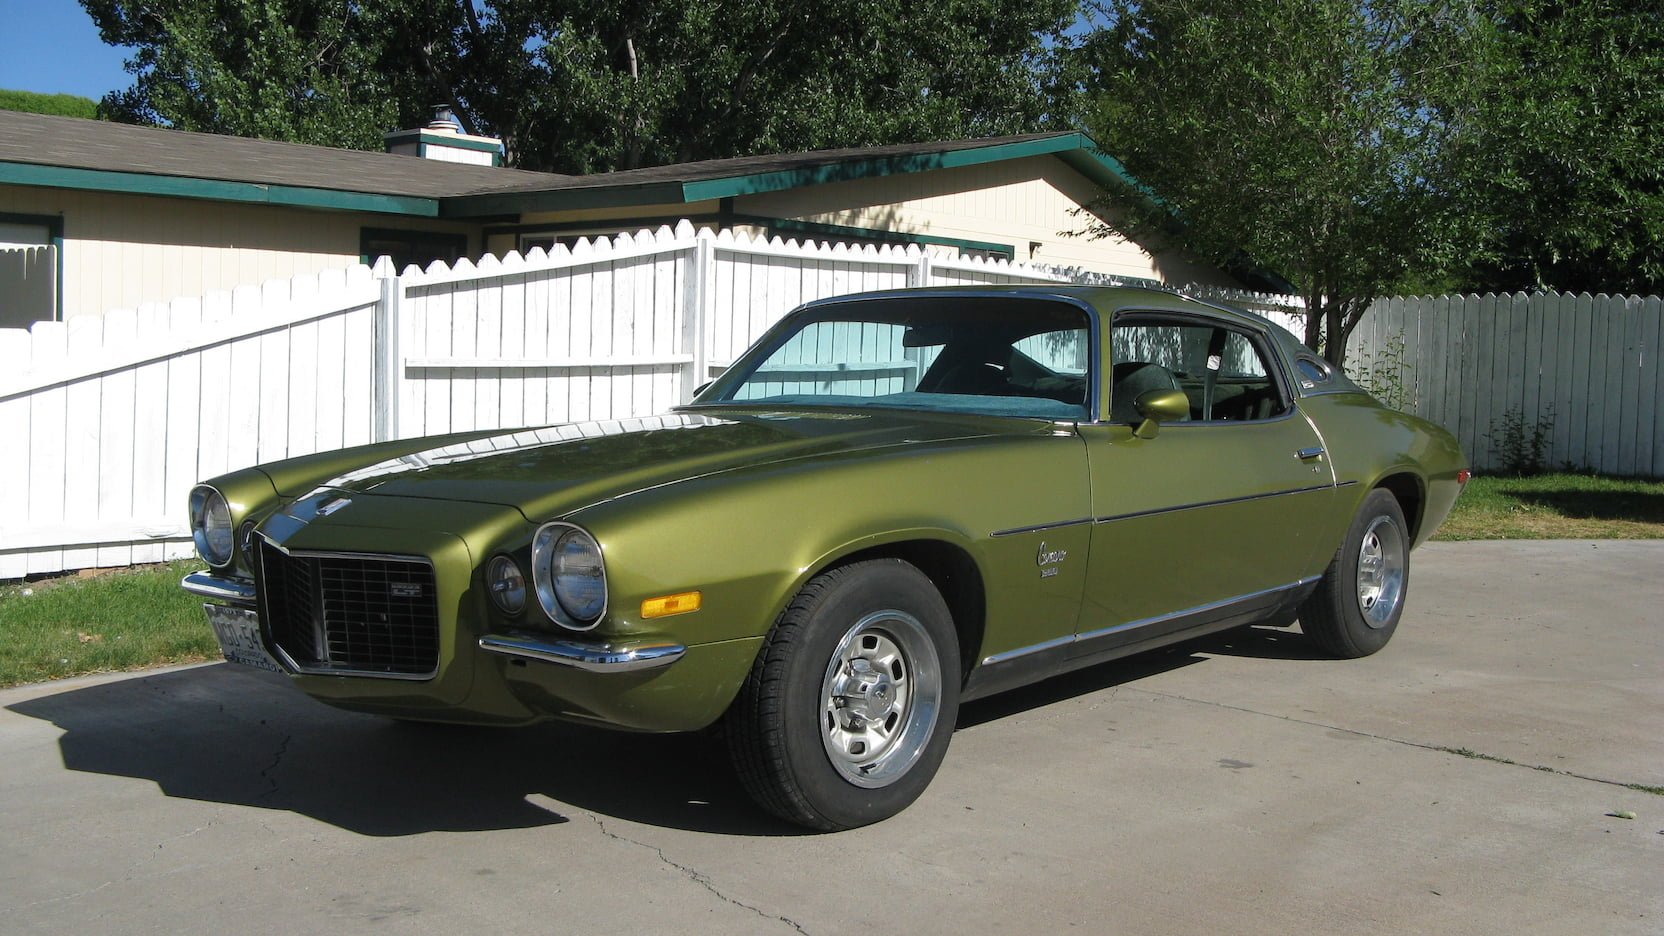 1973 Chevrolet Camaro LT Driver 3/4